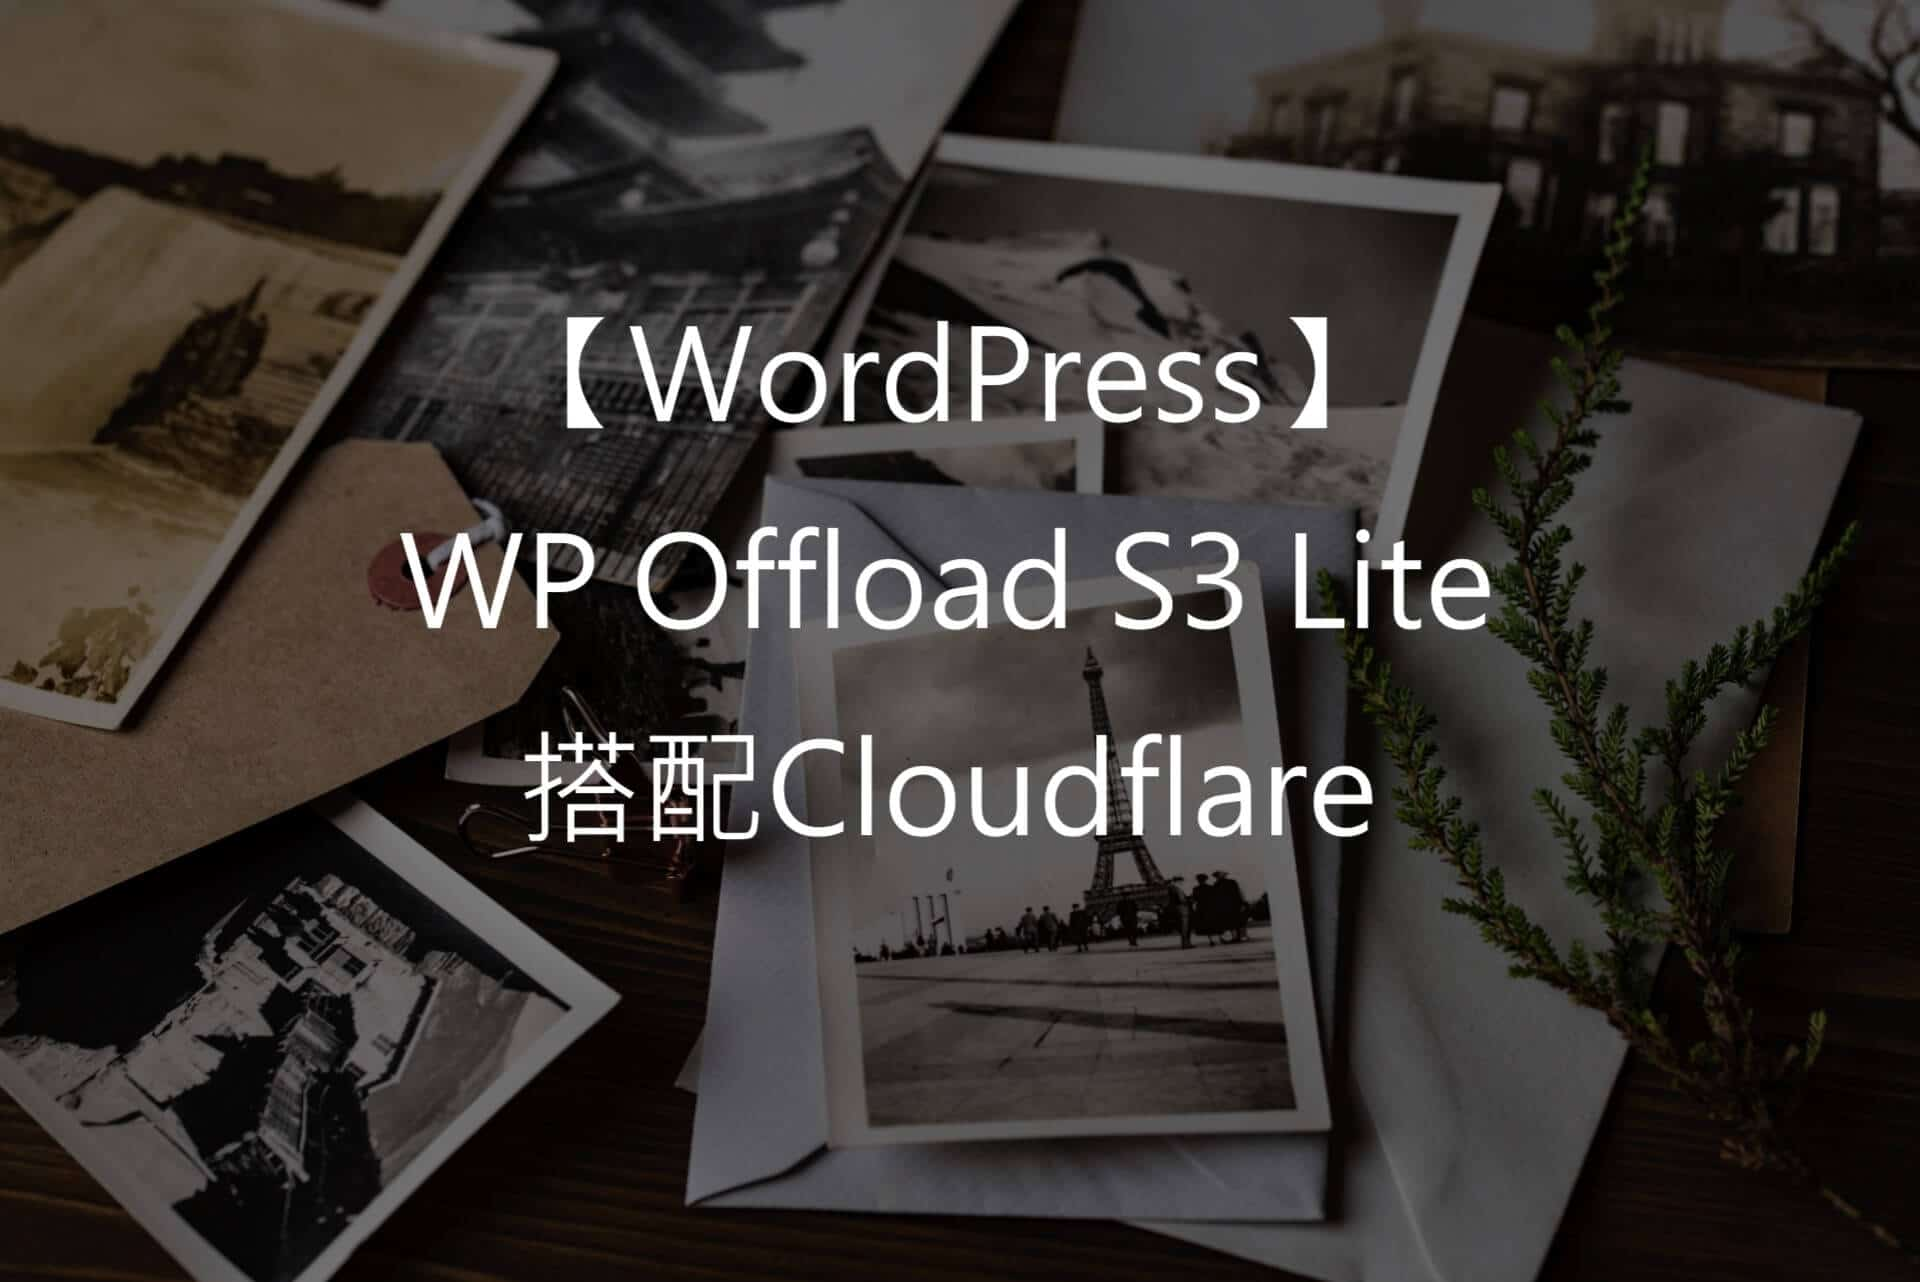 【WordPress】WP Offload S3 Lite搭配Cloudflare